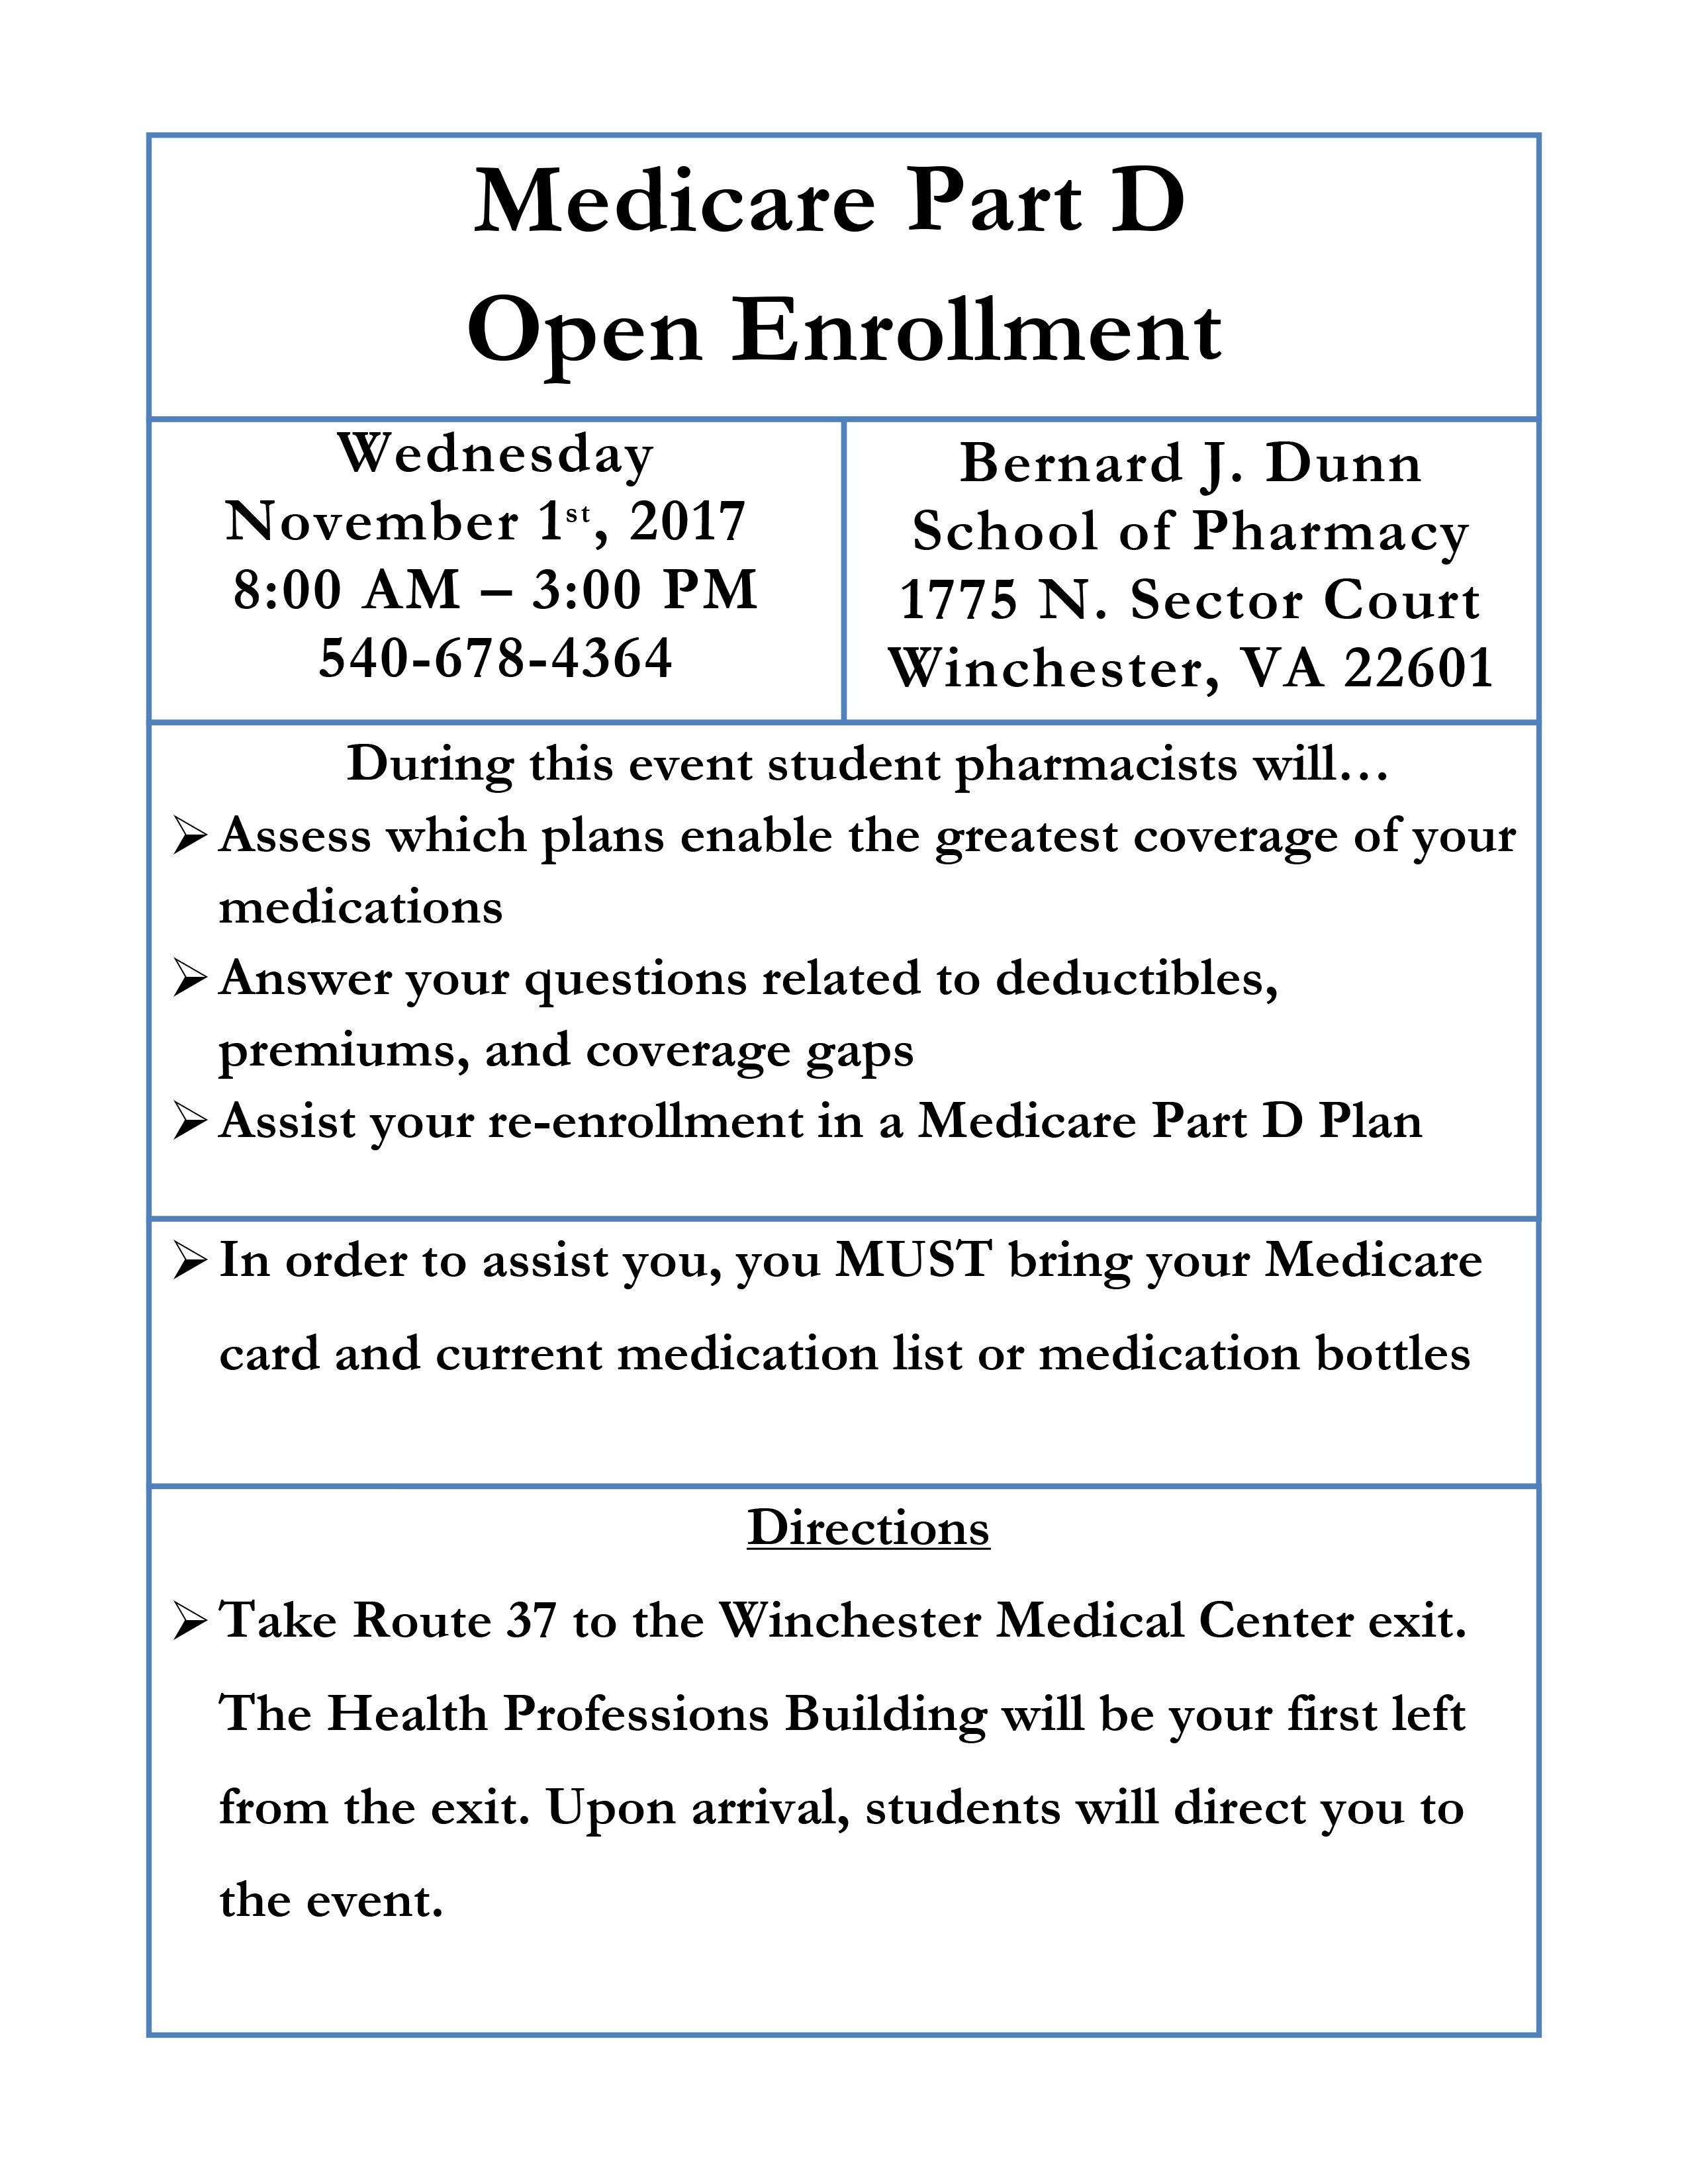 Medicare Part D Open Enrollment Amherst Family Practice